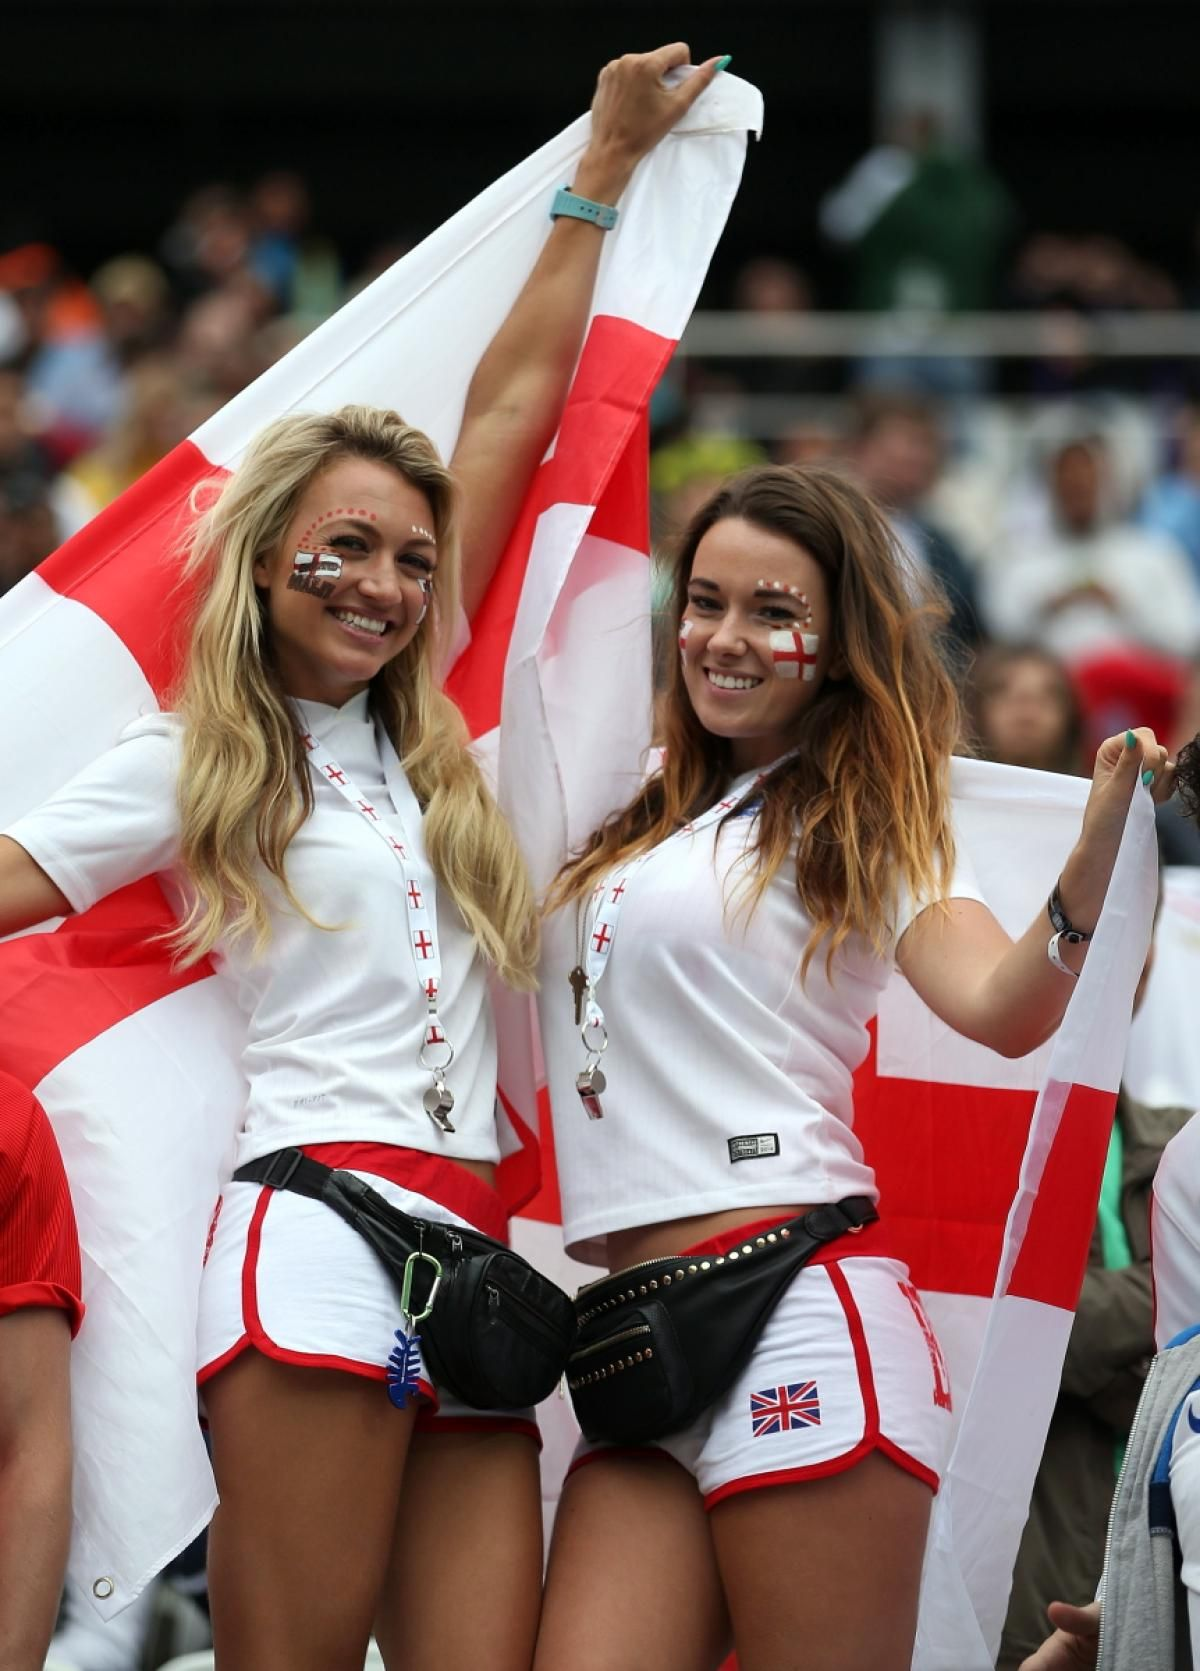 26 Hottest Fans Of The 2014 World Cup Hot Fan Soccer Fans Football Fans